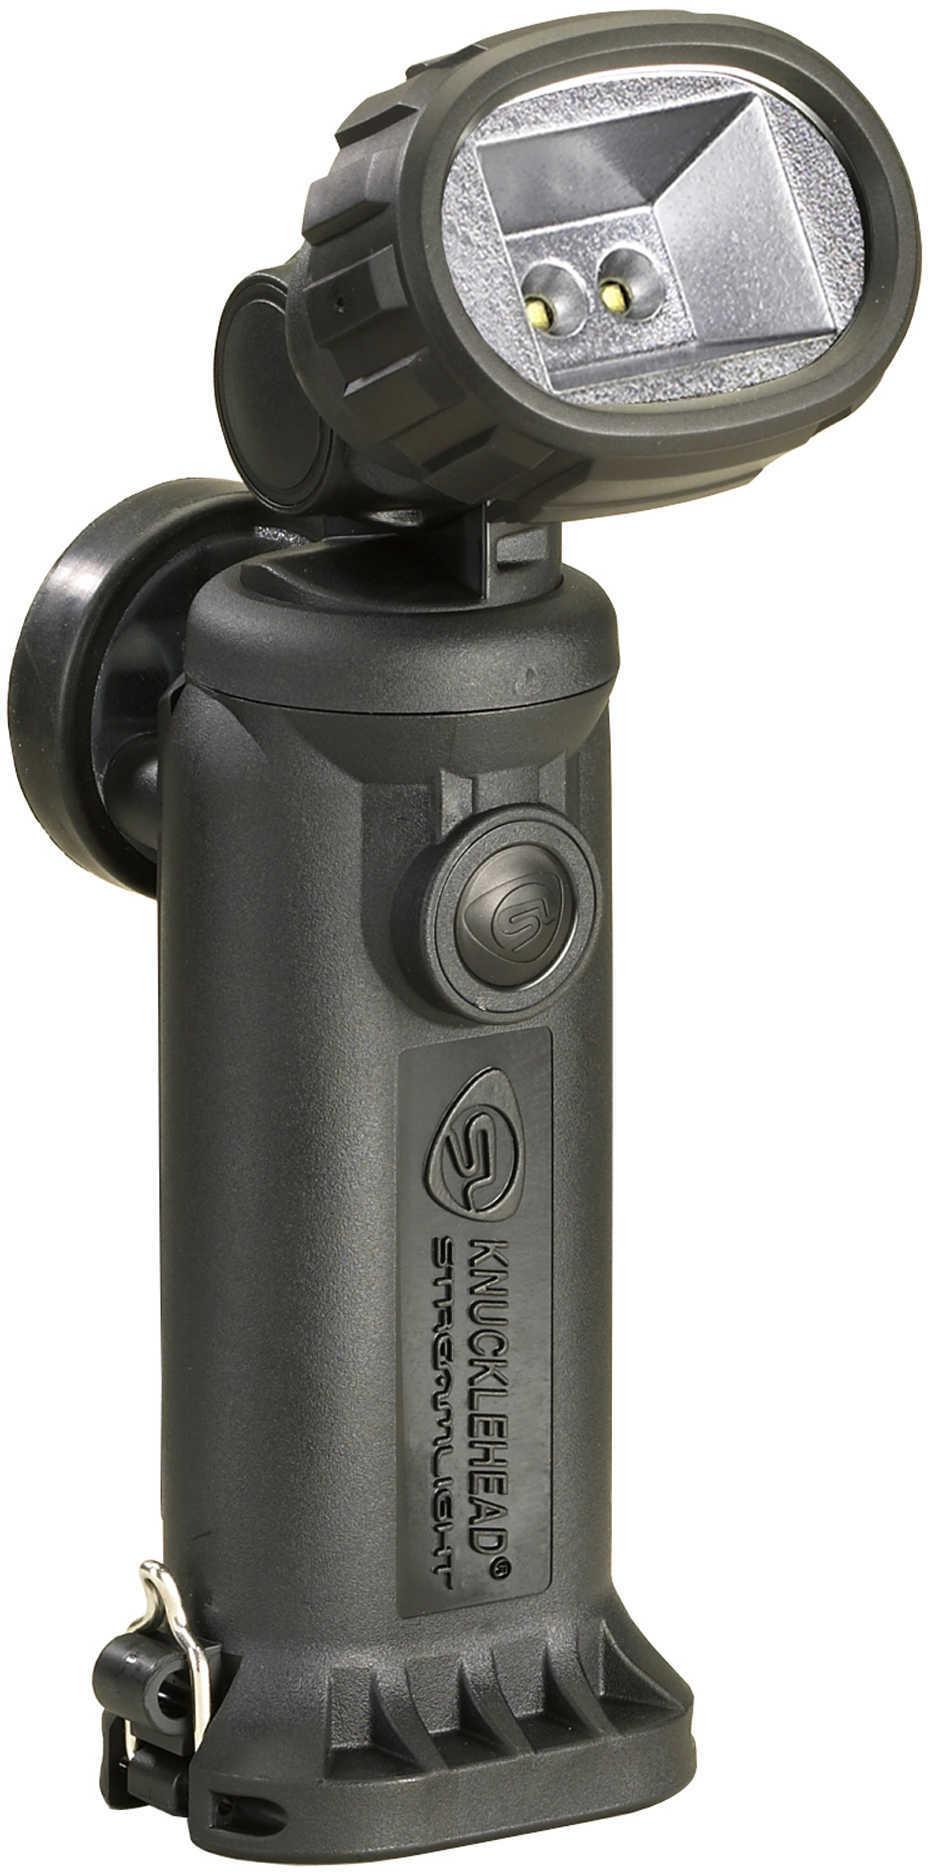 Streamlight Knucklehead Light W/12V Dc Fast Charge, Black Md: 90620